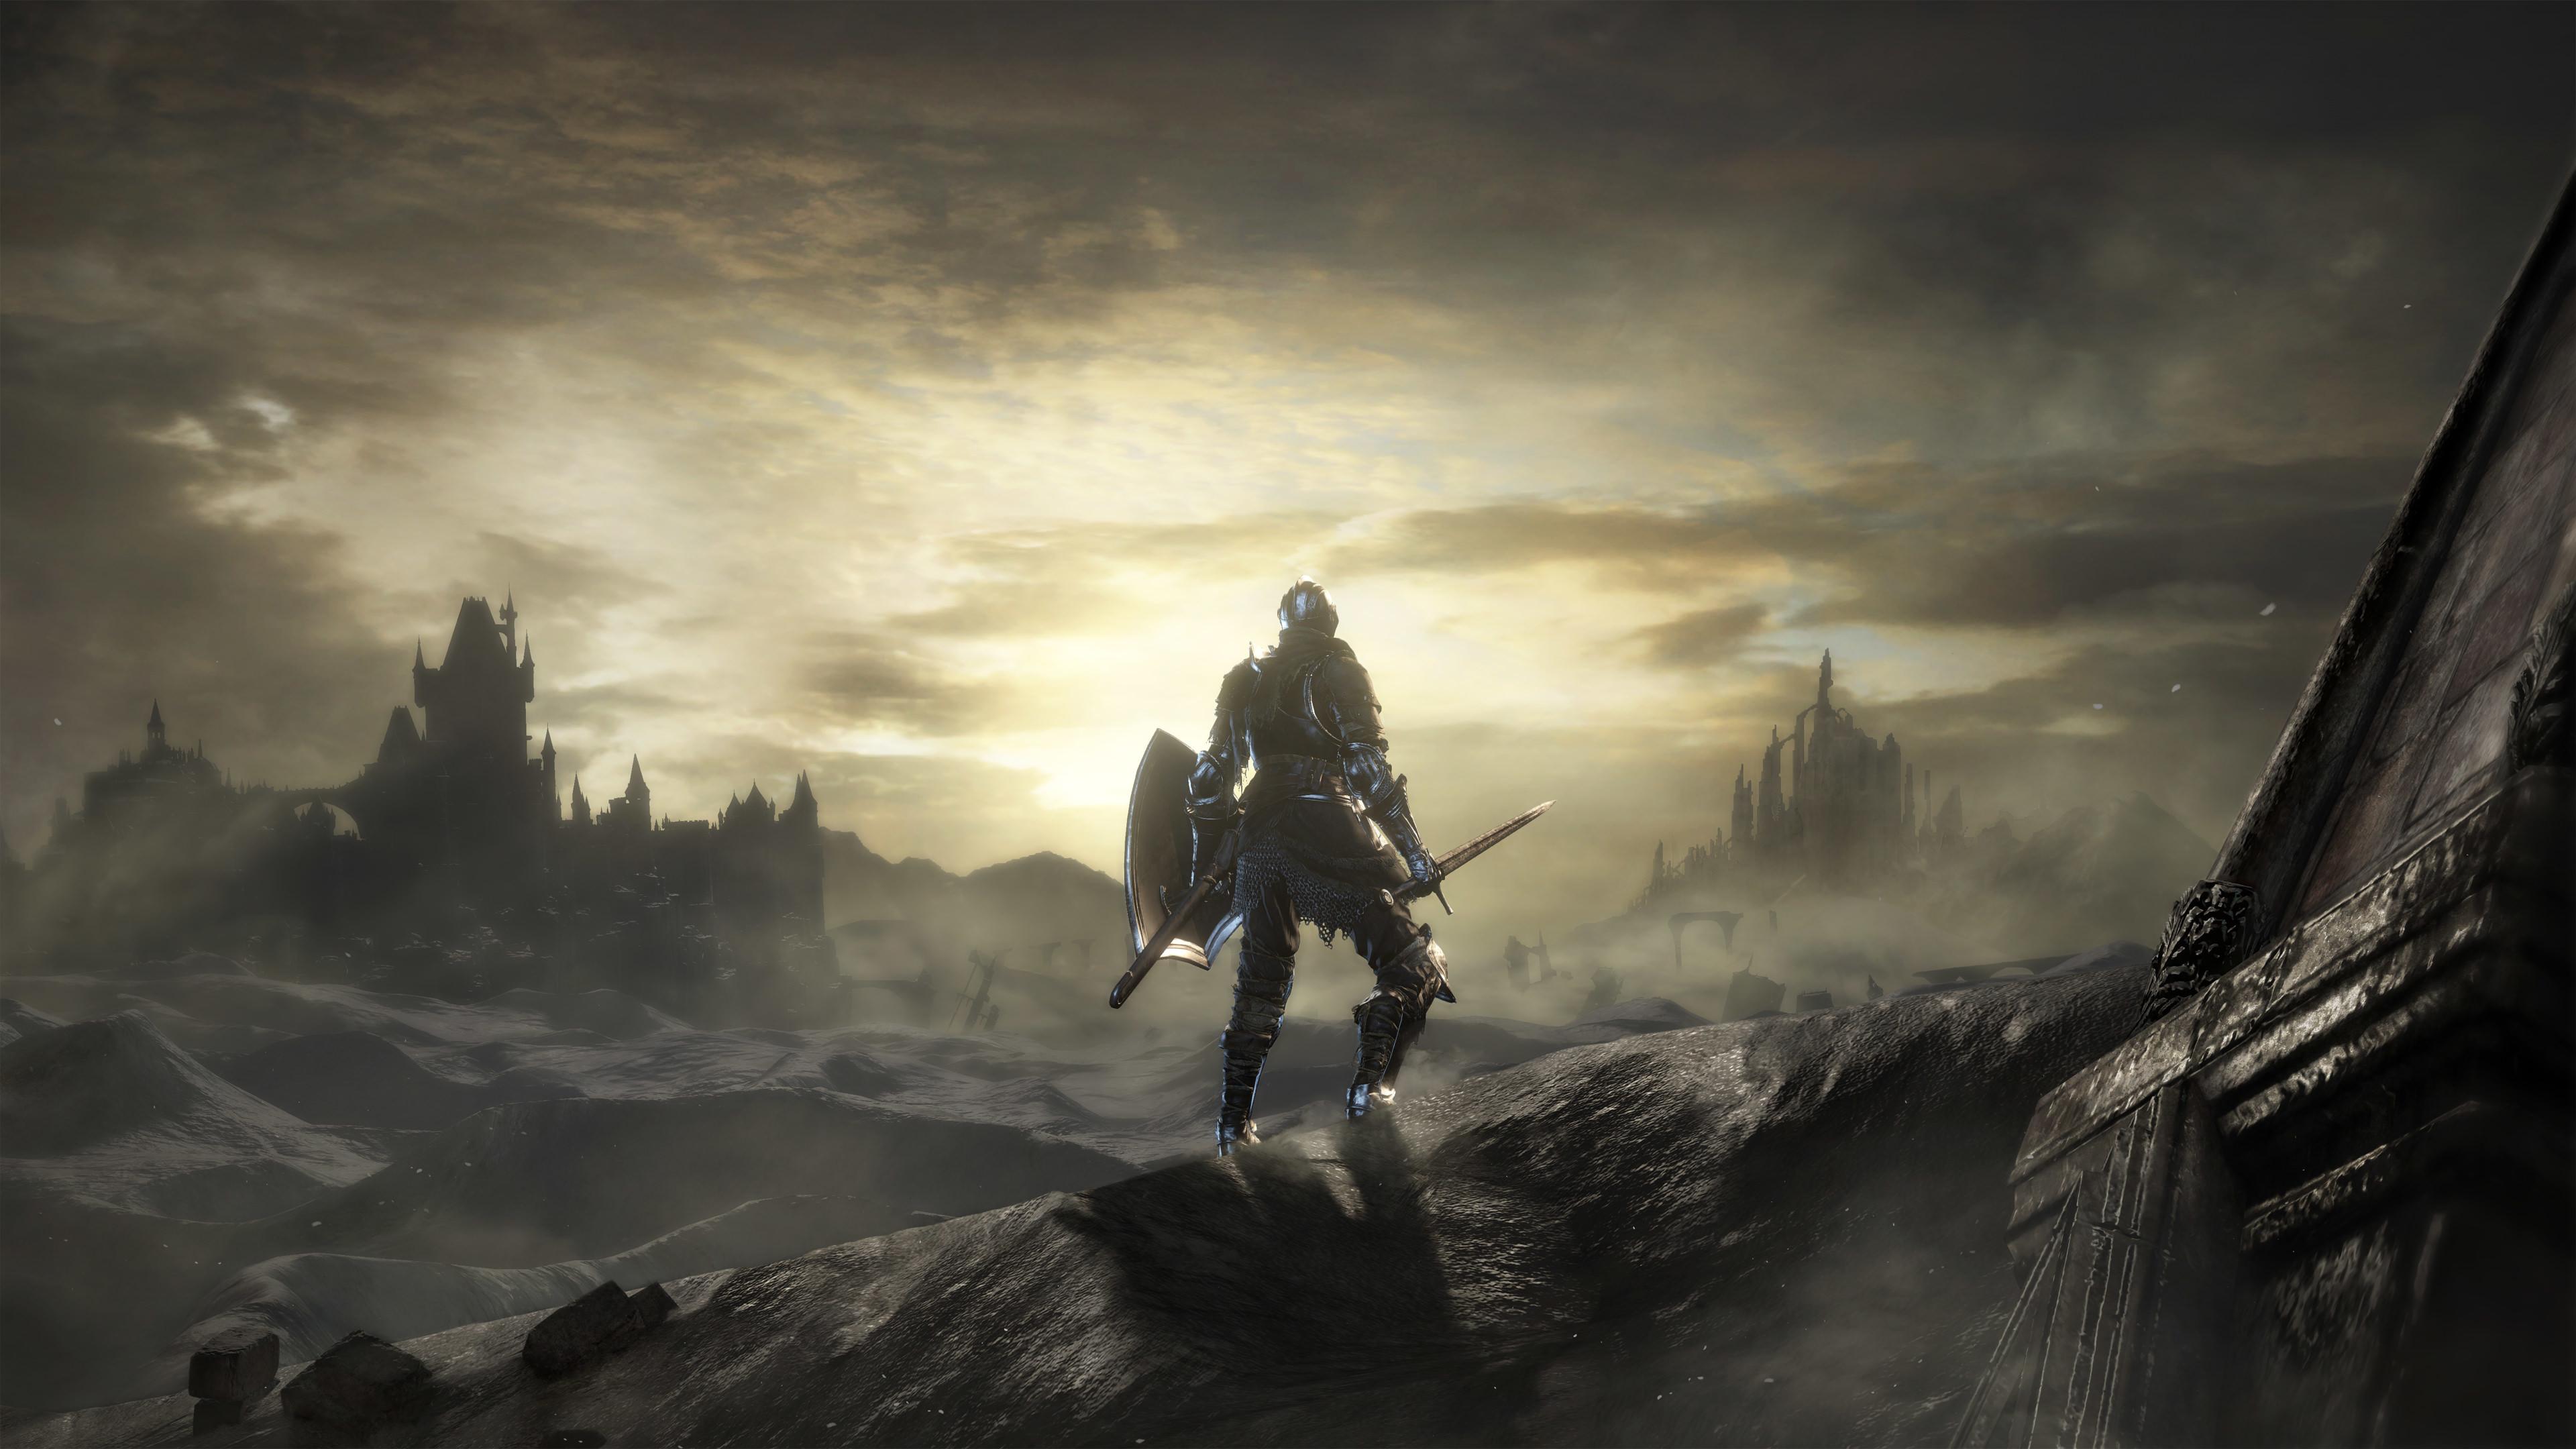 Dark Souls III, The Ringed City, DLC, 4K, 2017